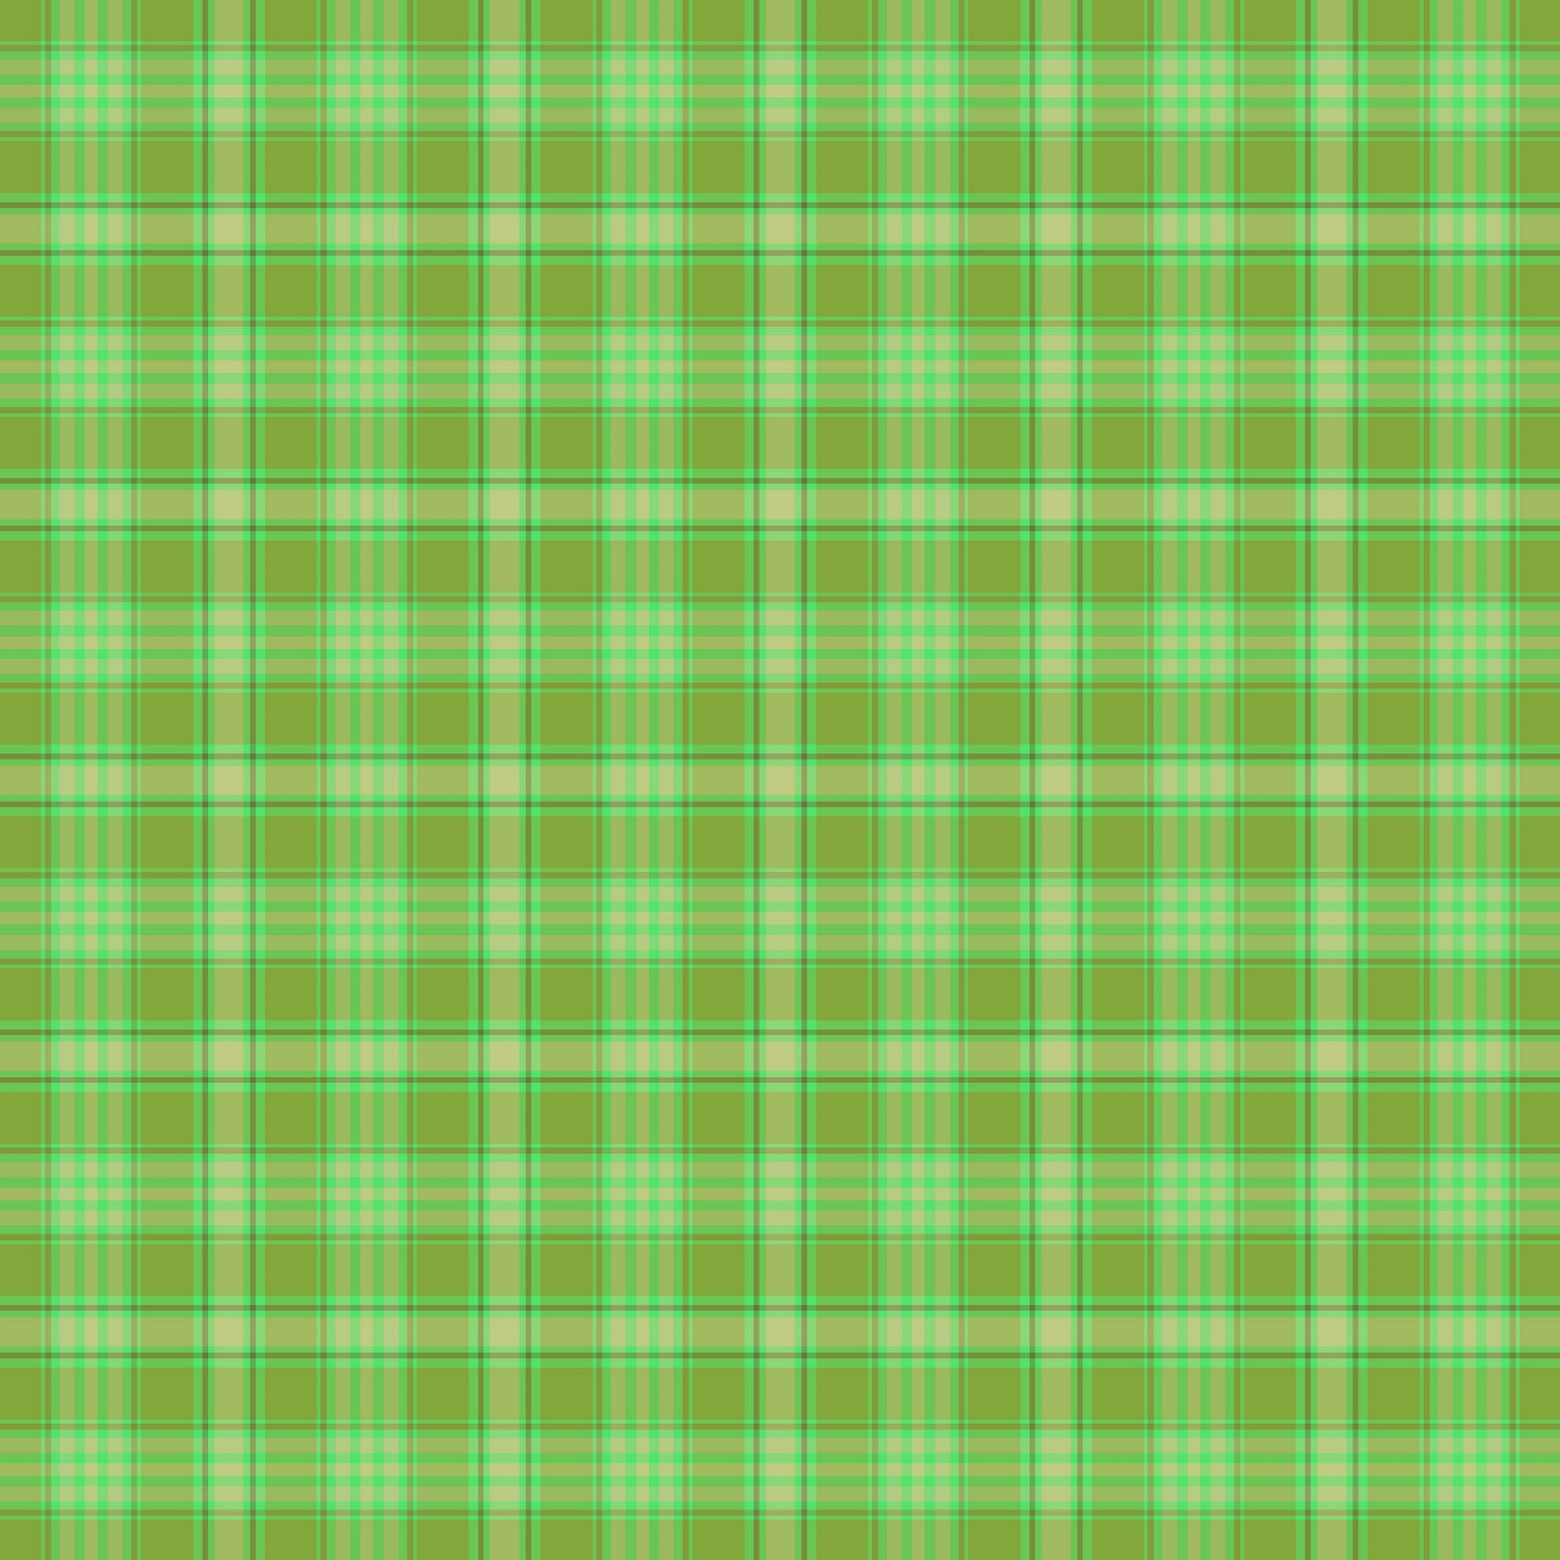 green-2045576